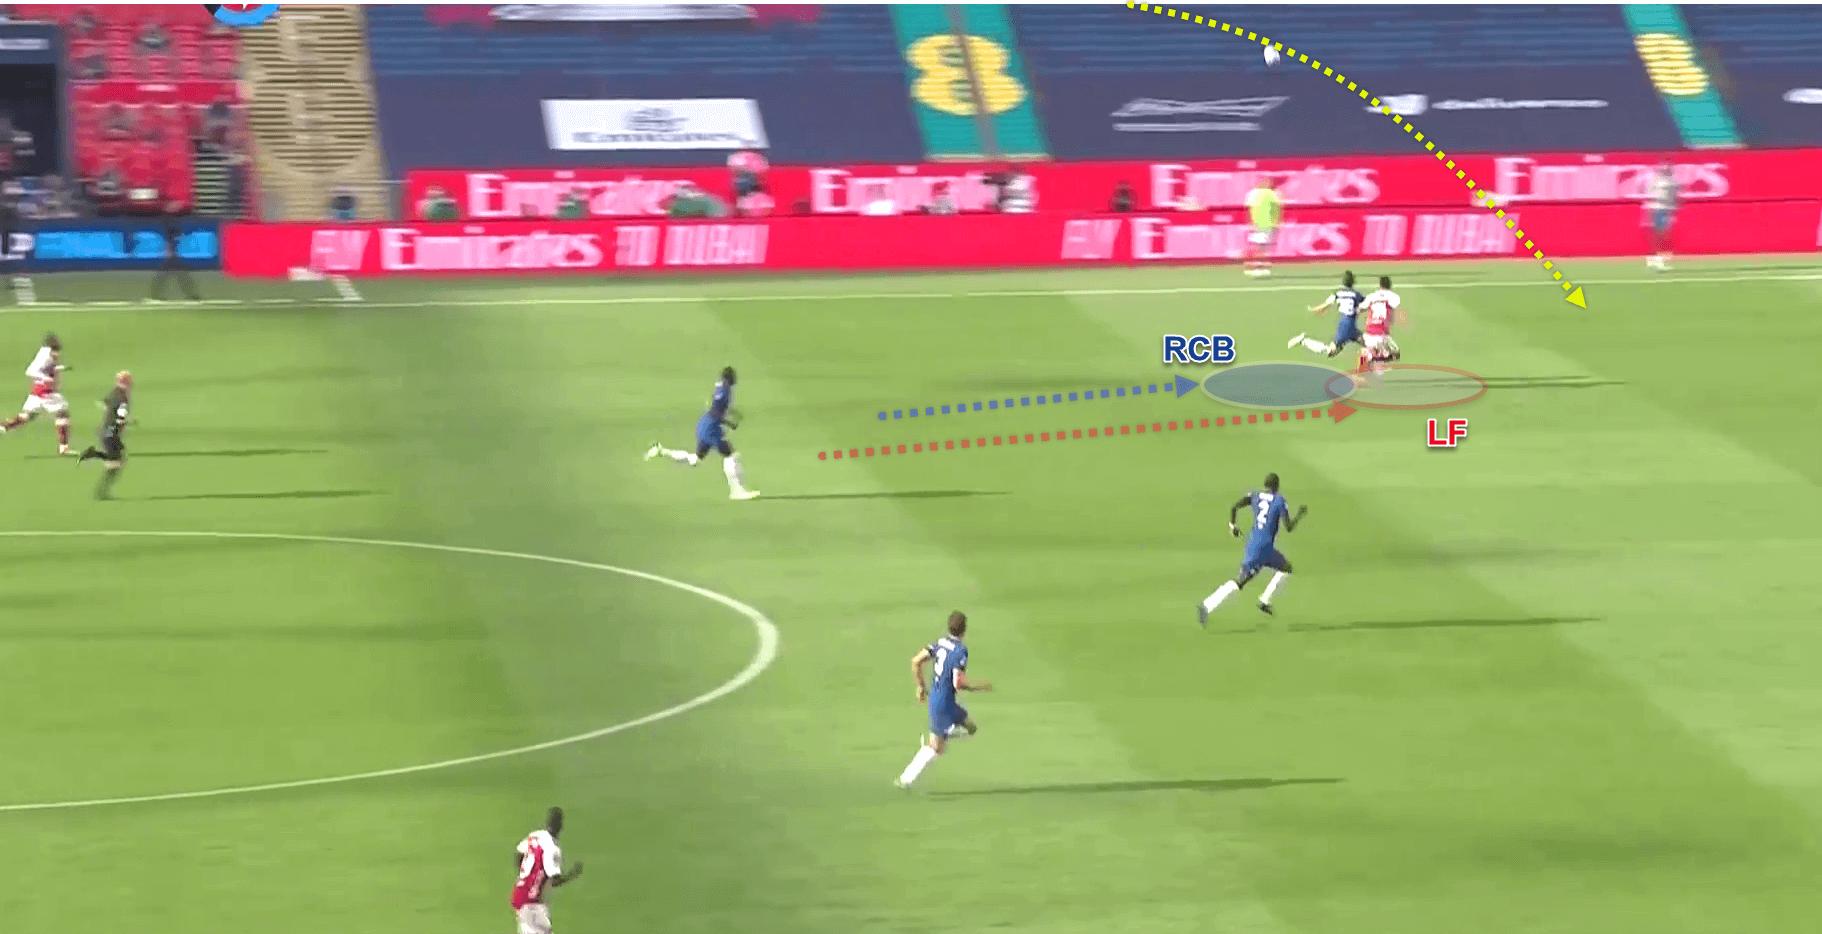 FA Cup 2019/20: Arsenal v Chelsea - tactical analysis - tactics